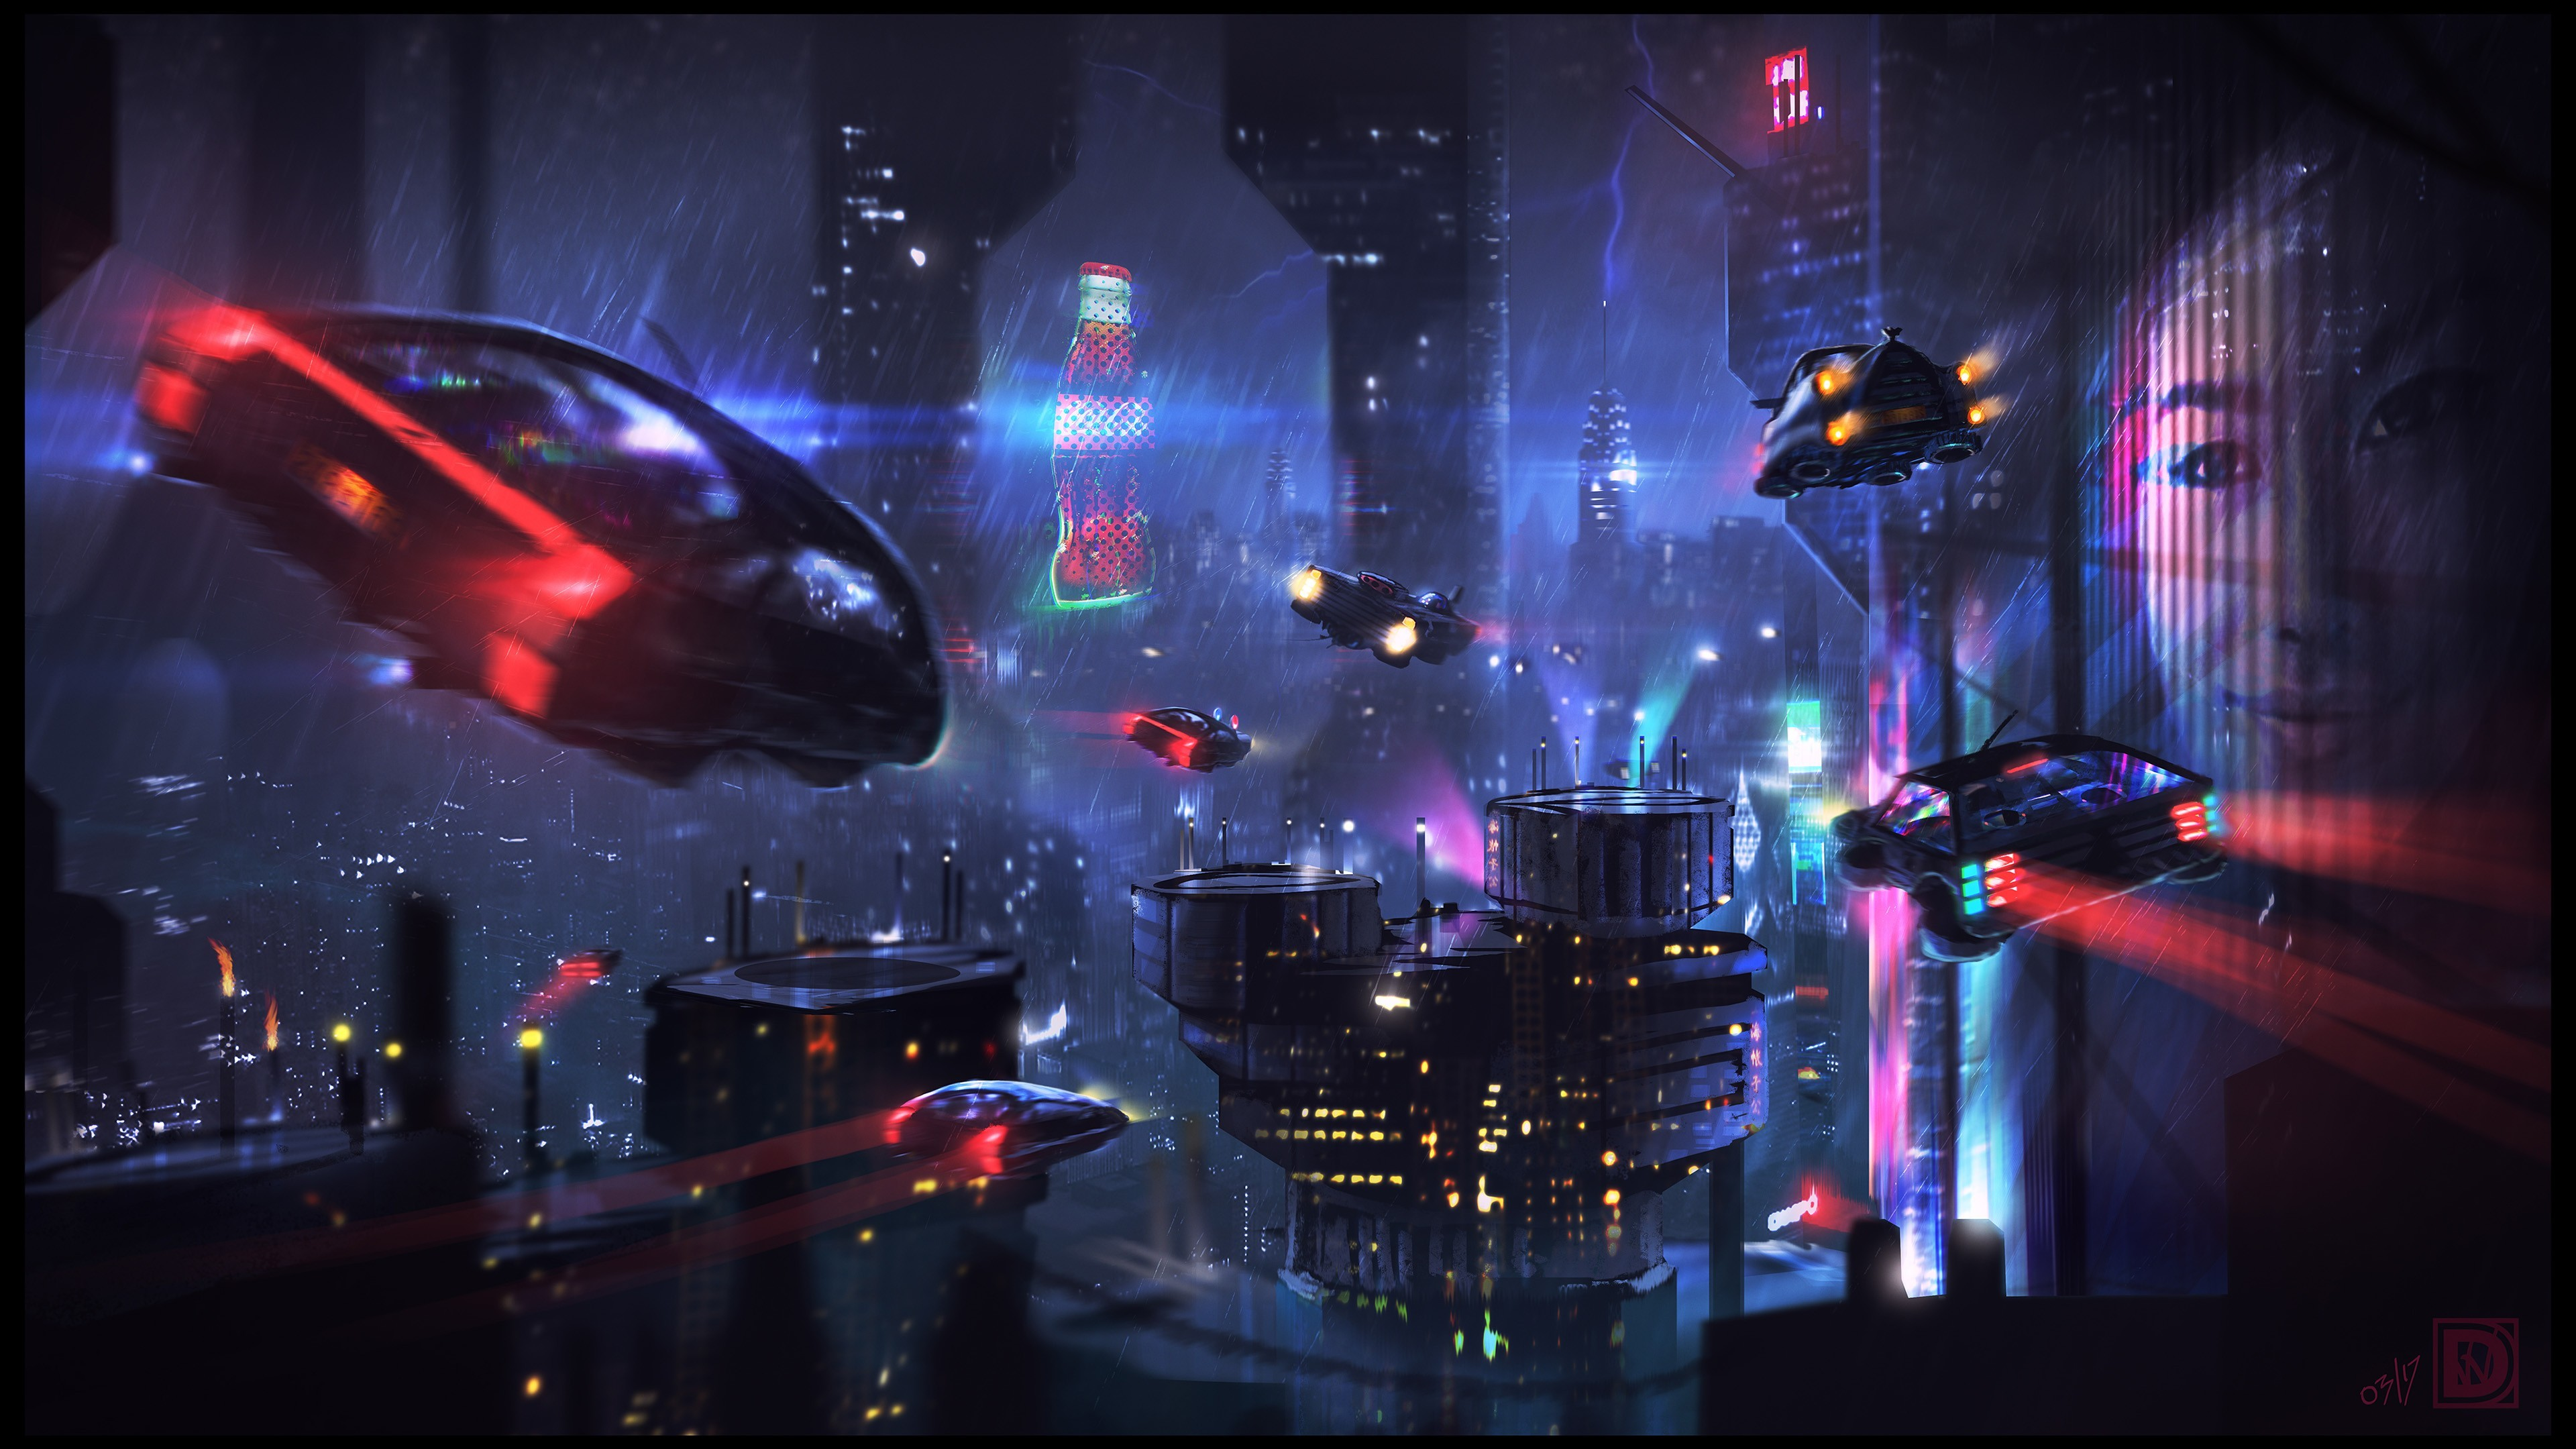 science fiction city 4k 1540749146 - Science Fiction City 4k - science fiction wallpapers, hd-wallpapers, digital art wallpapers, artist wallpapers, 4k-wallpapers